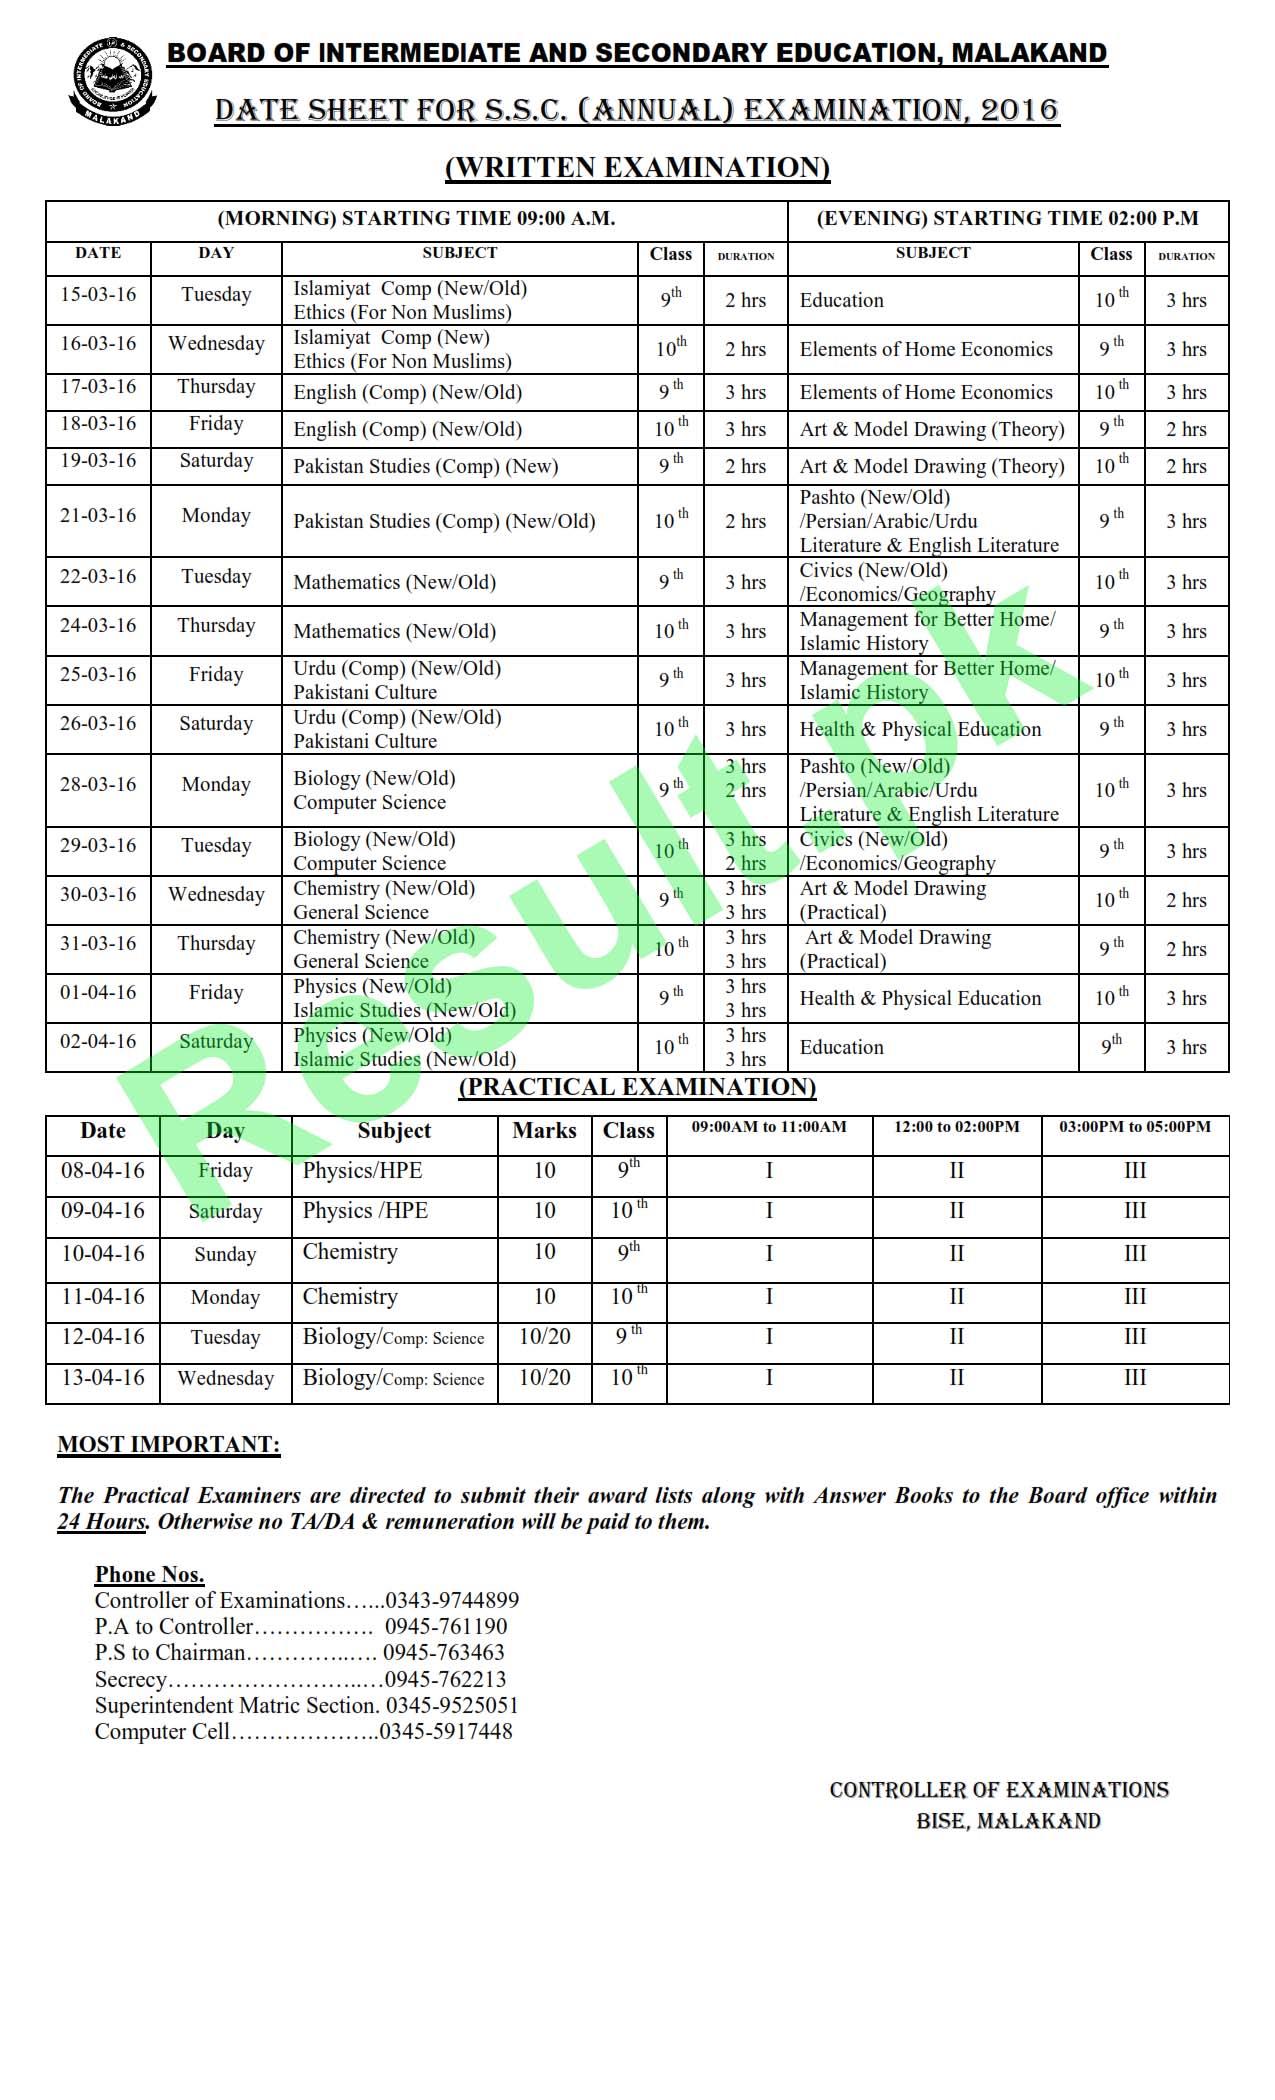 BISE ATD Matric Part 1 Date Sheet 2016